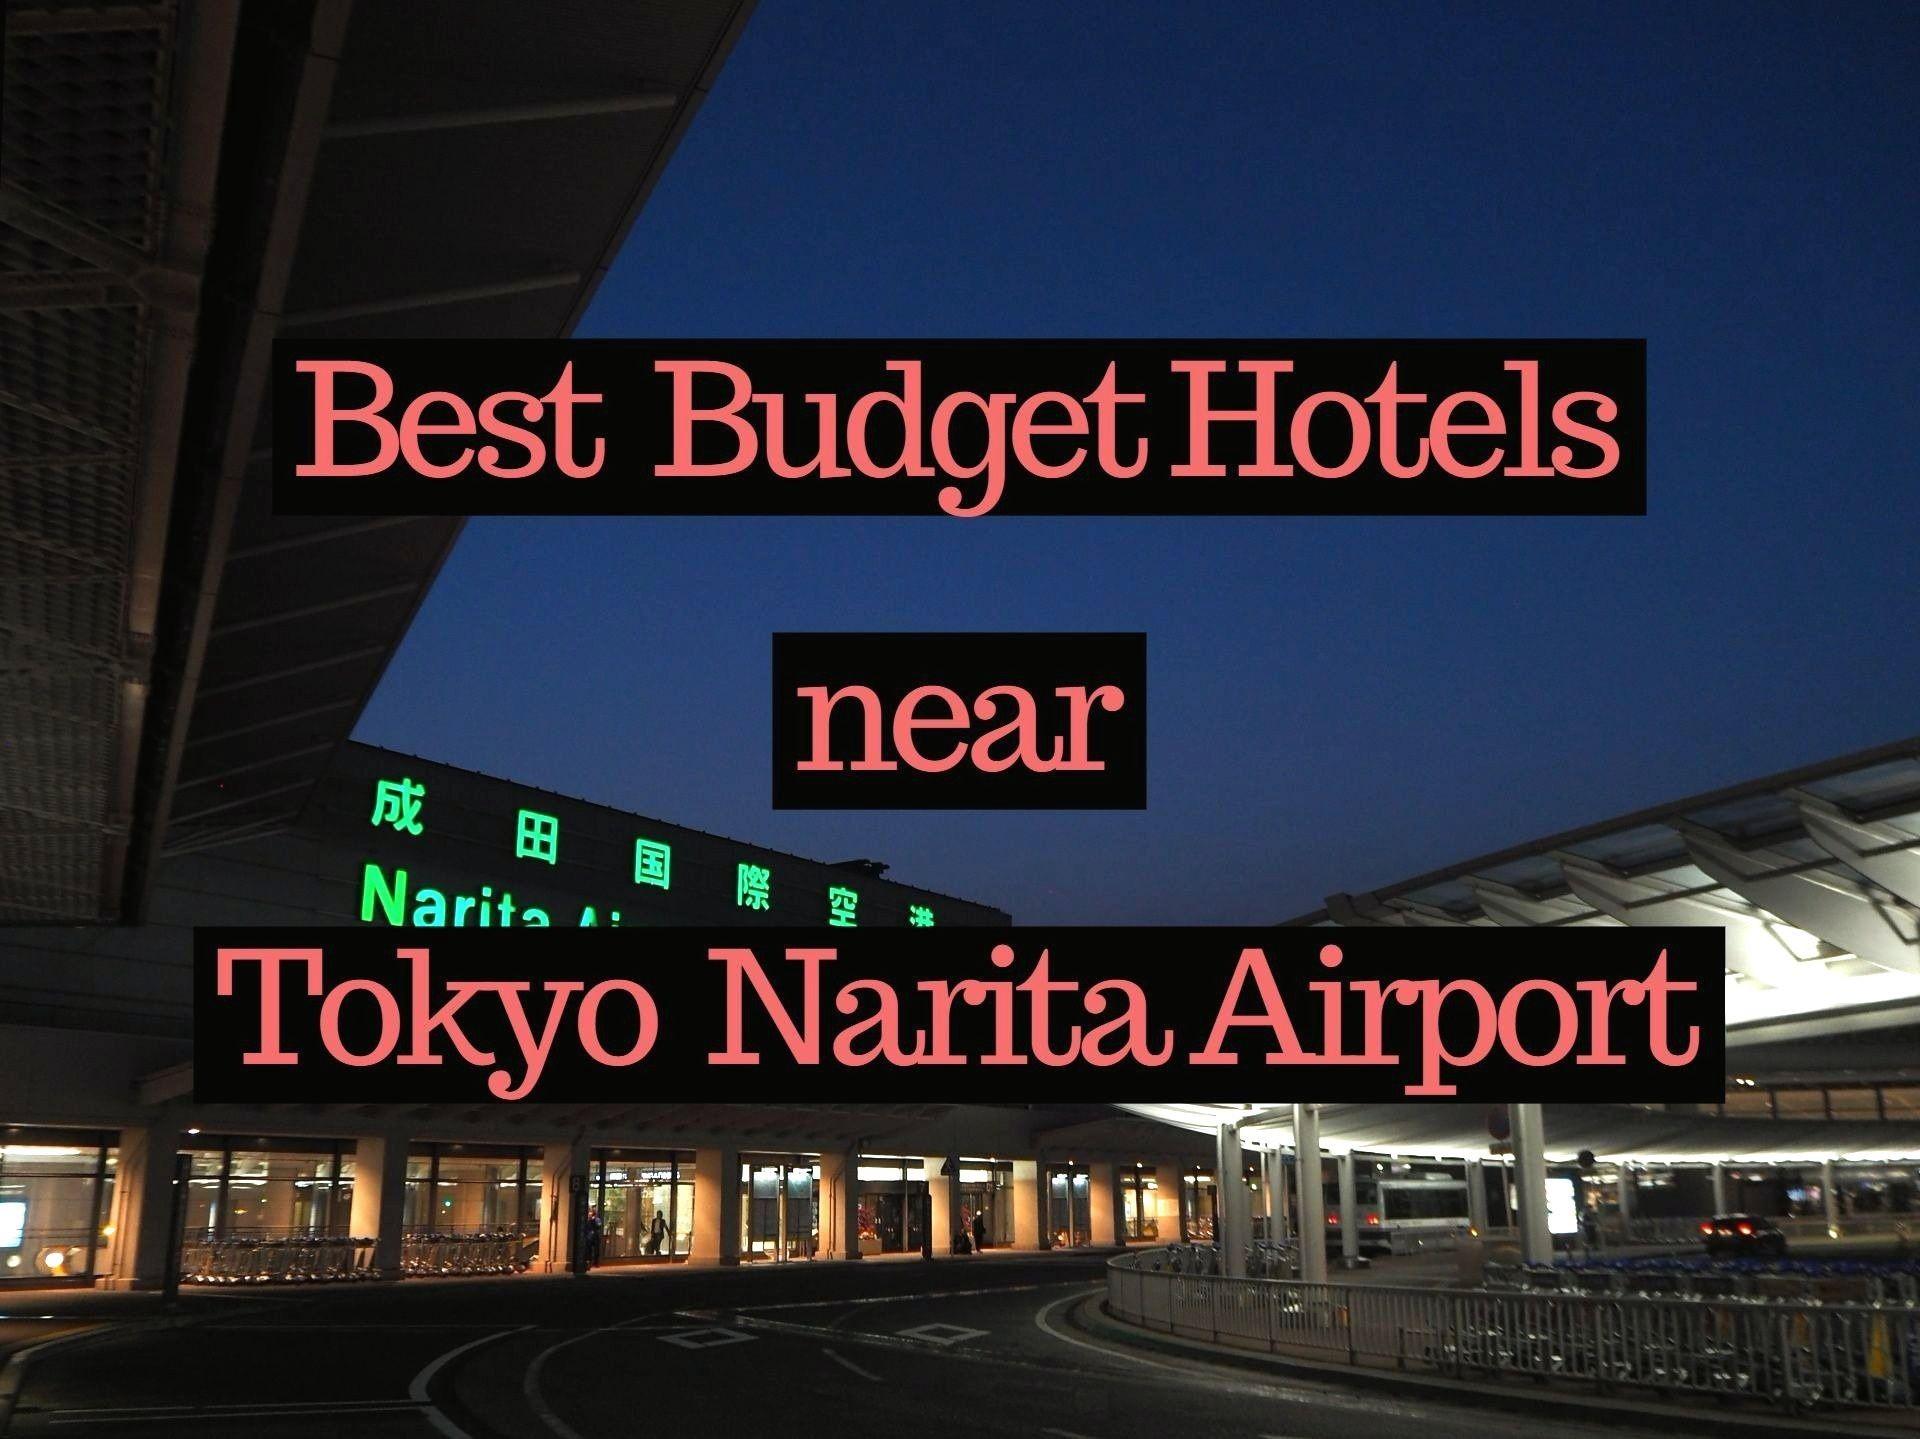 Cheap Hotels In tokyo Near Narita Airport Luxury 5 Best Cheap Hotels Near Narita Airport 2019 – Japan Travel Guide